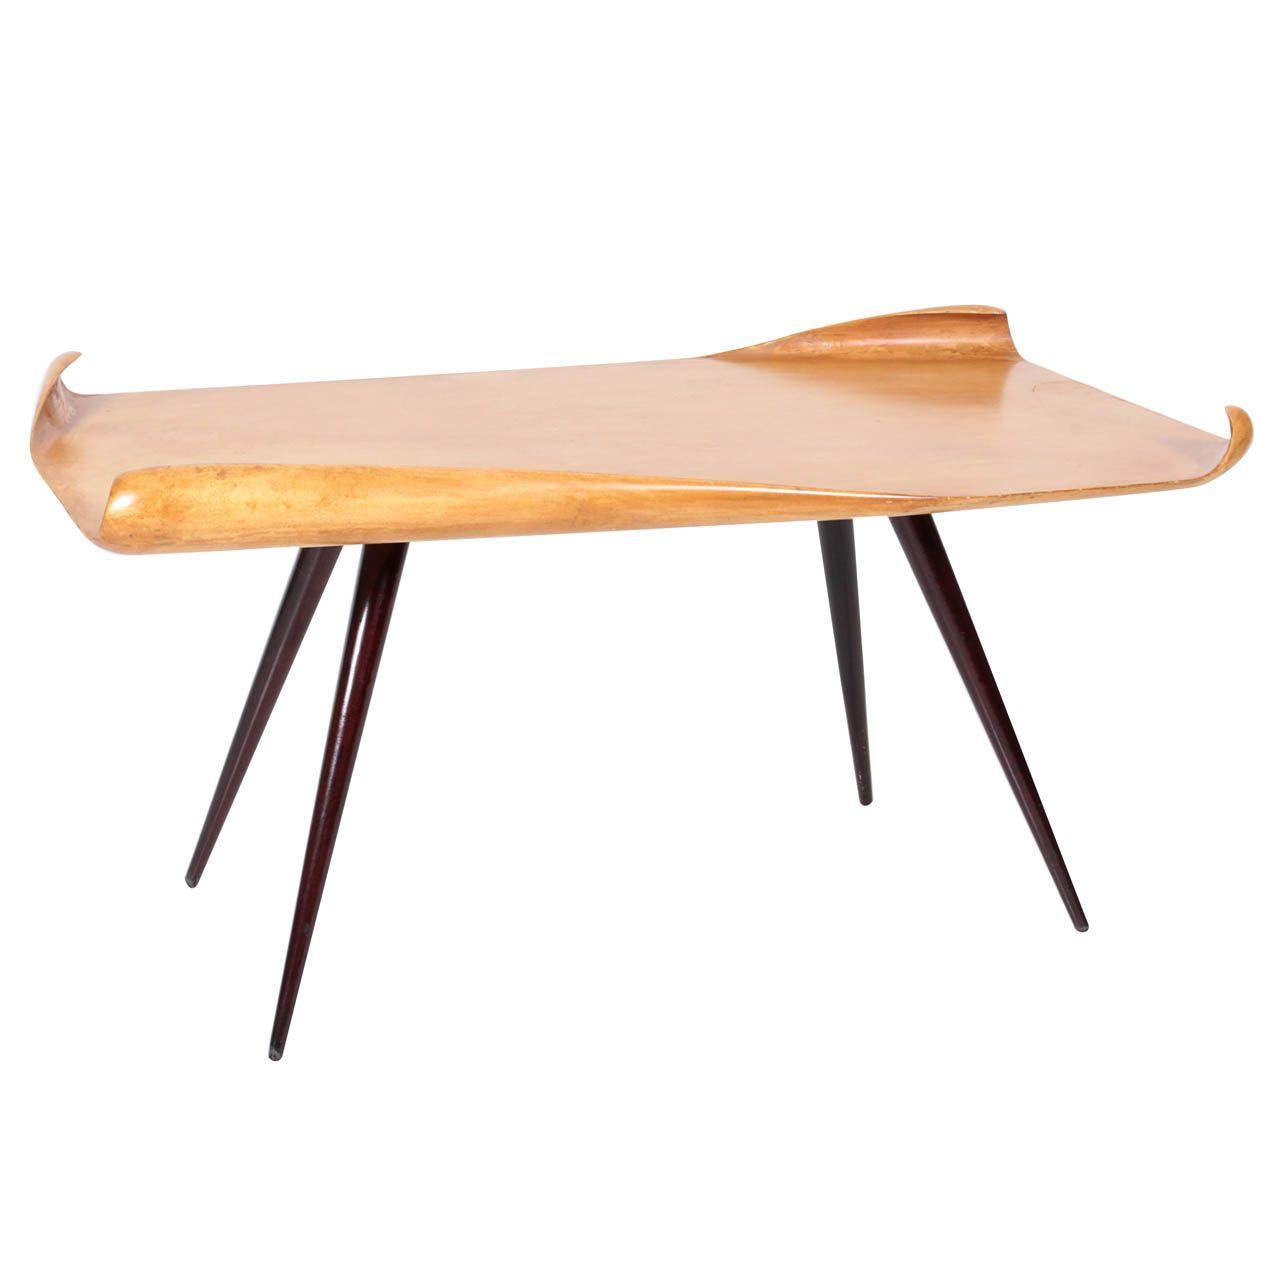 Post Modern Coffee Tables: Aldo Tura / Italian Post-War Coffee Table With Furled